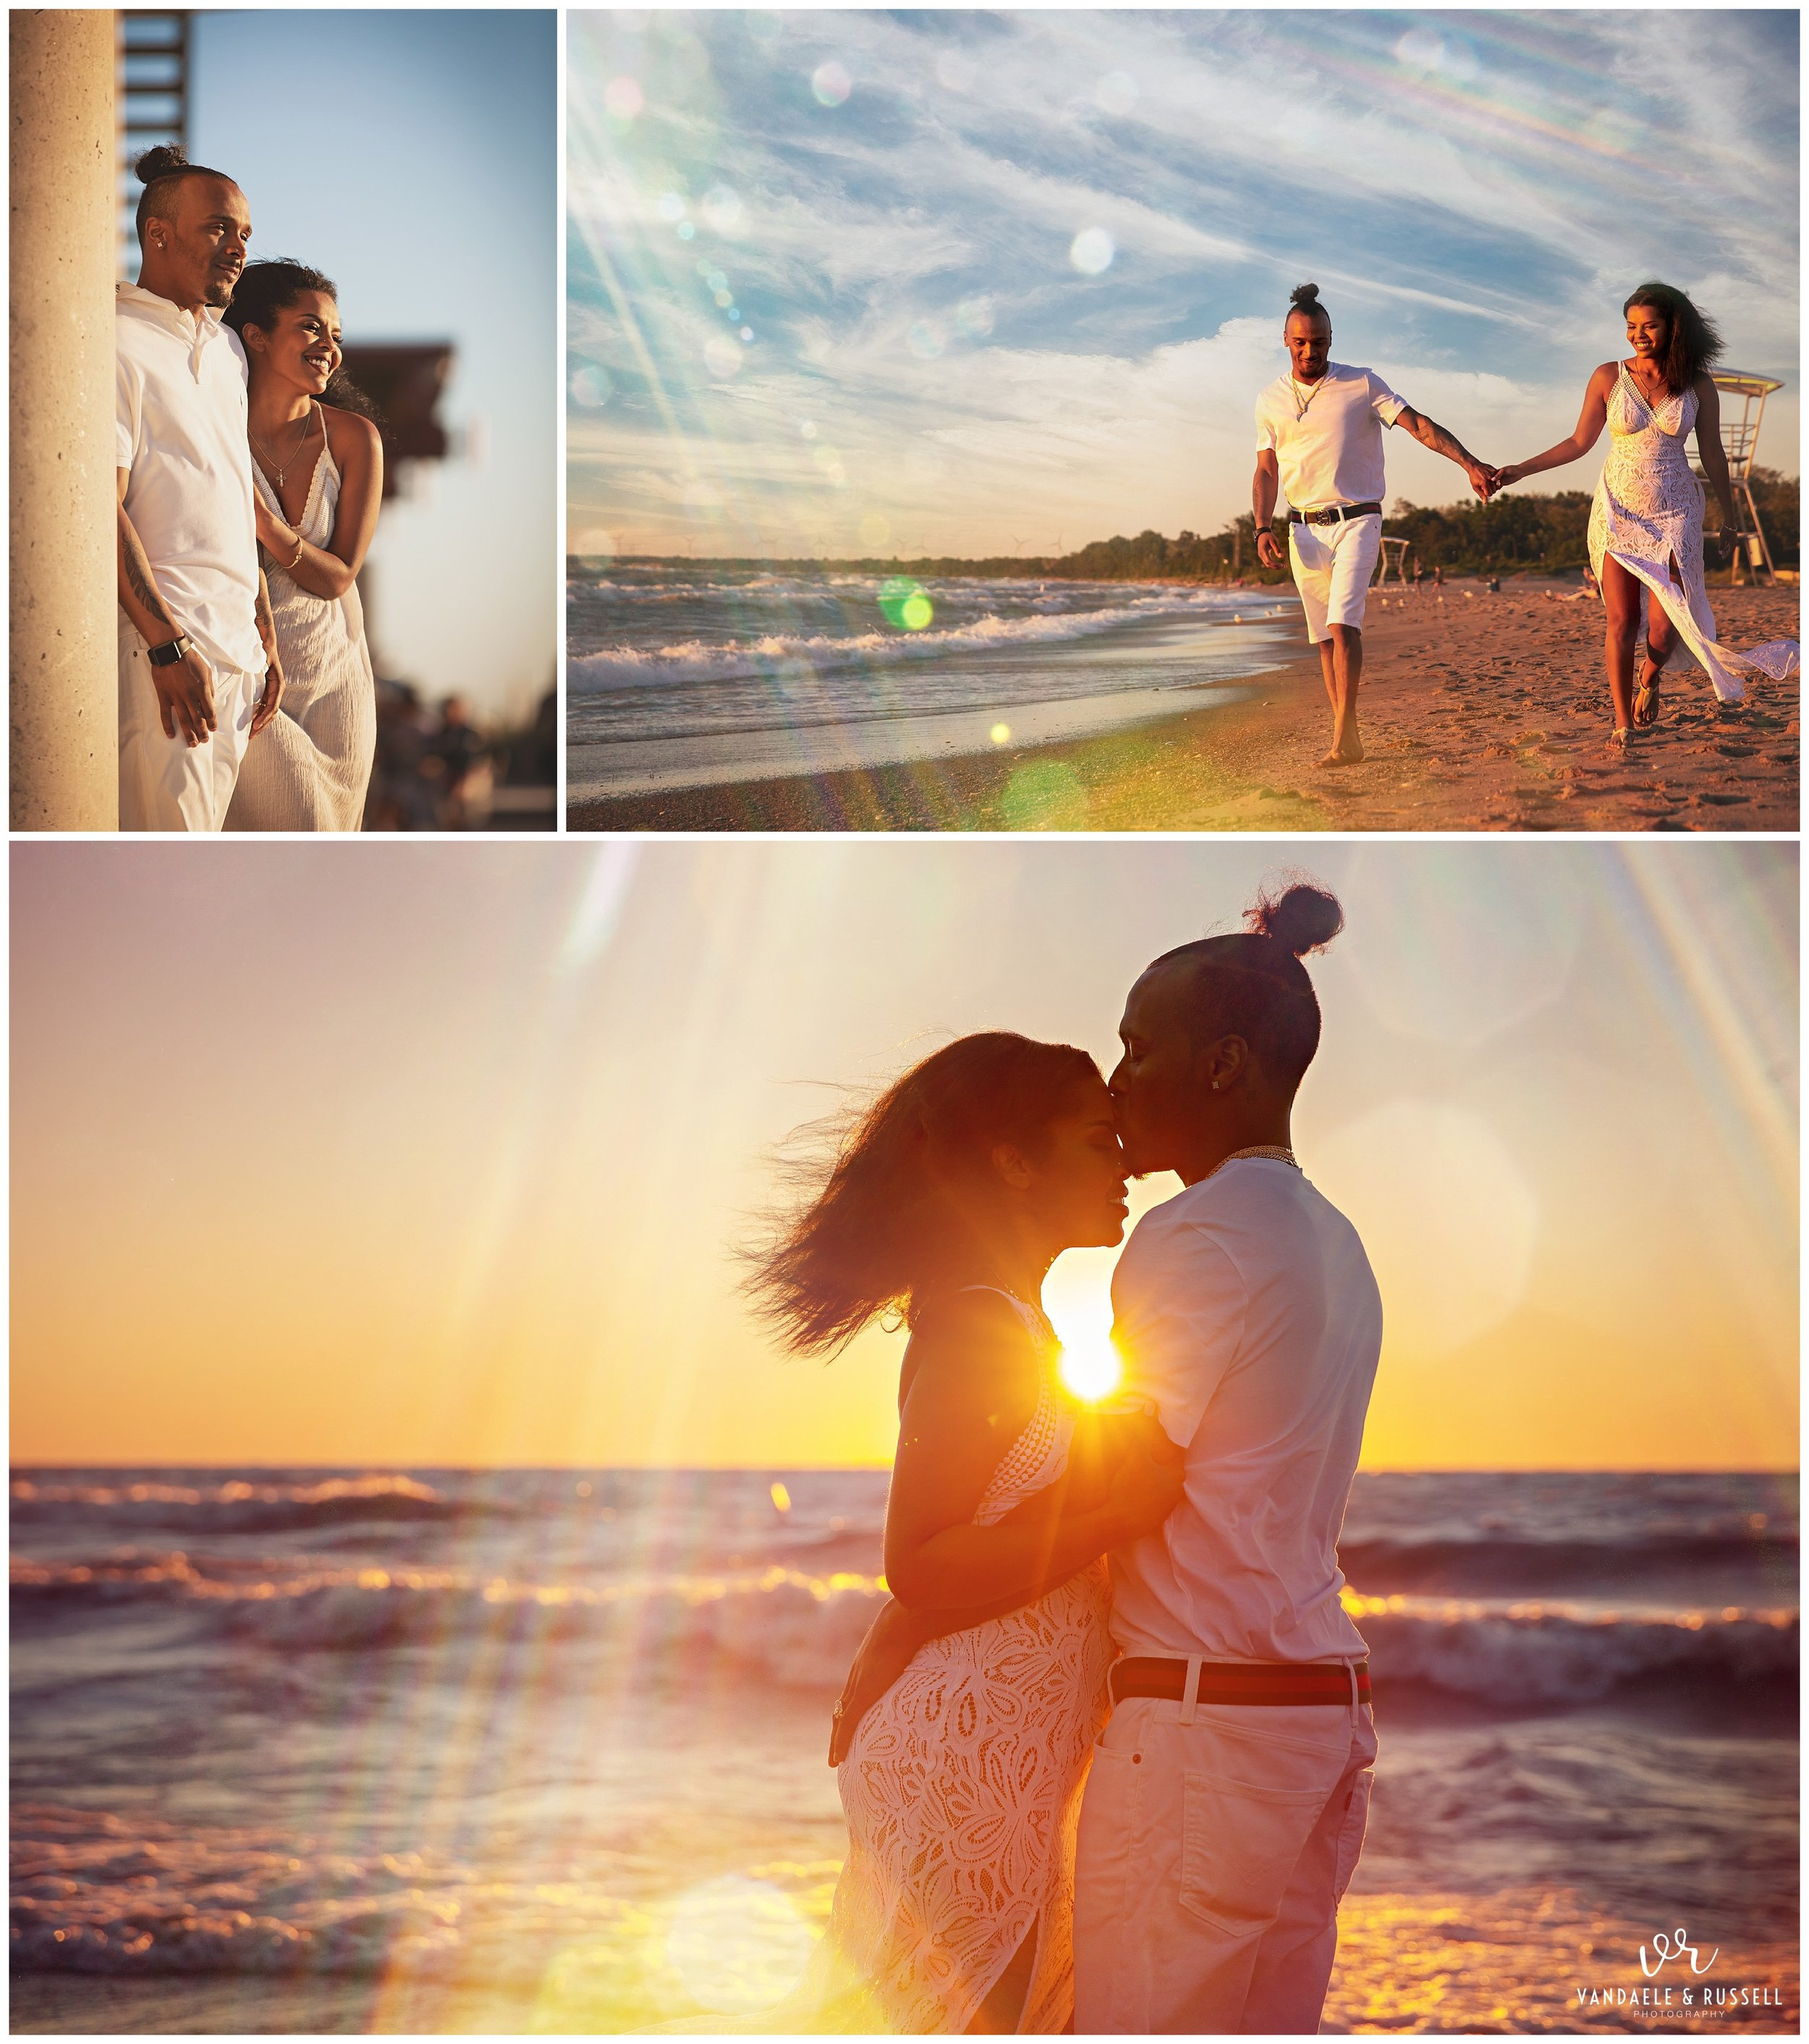 VanDaele-Russell-Wedding-Photography-London-Toronto-Ontario_0133.jpg